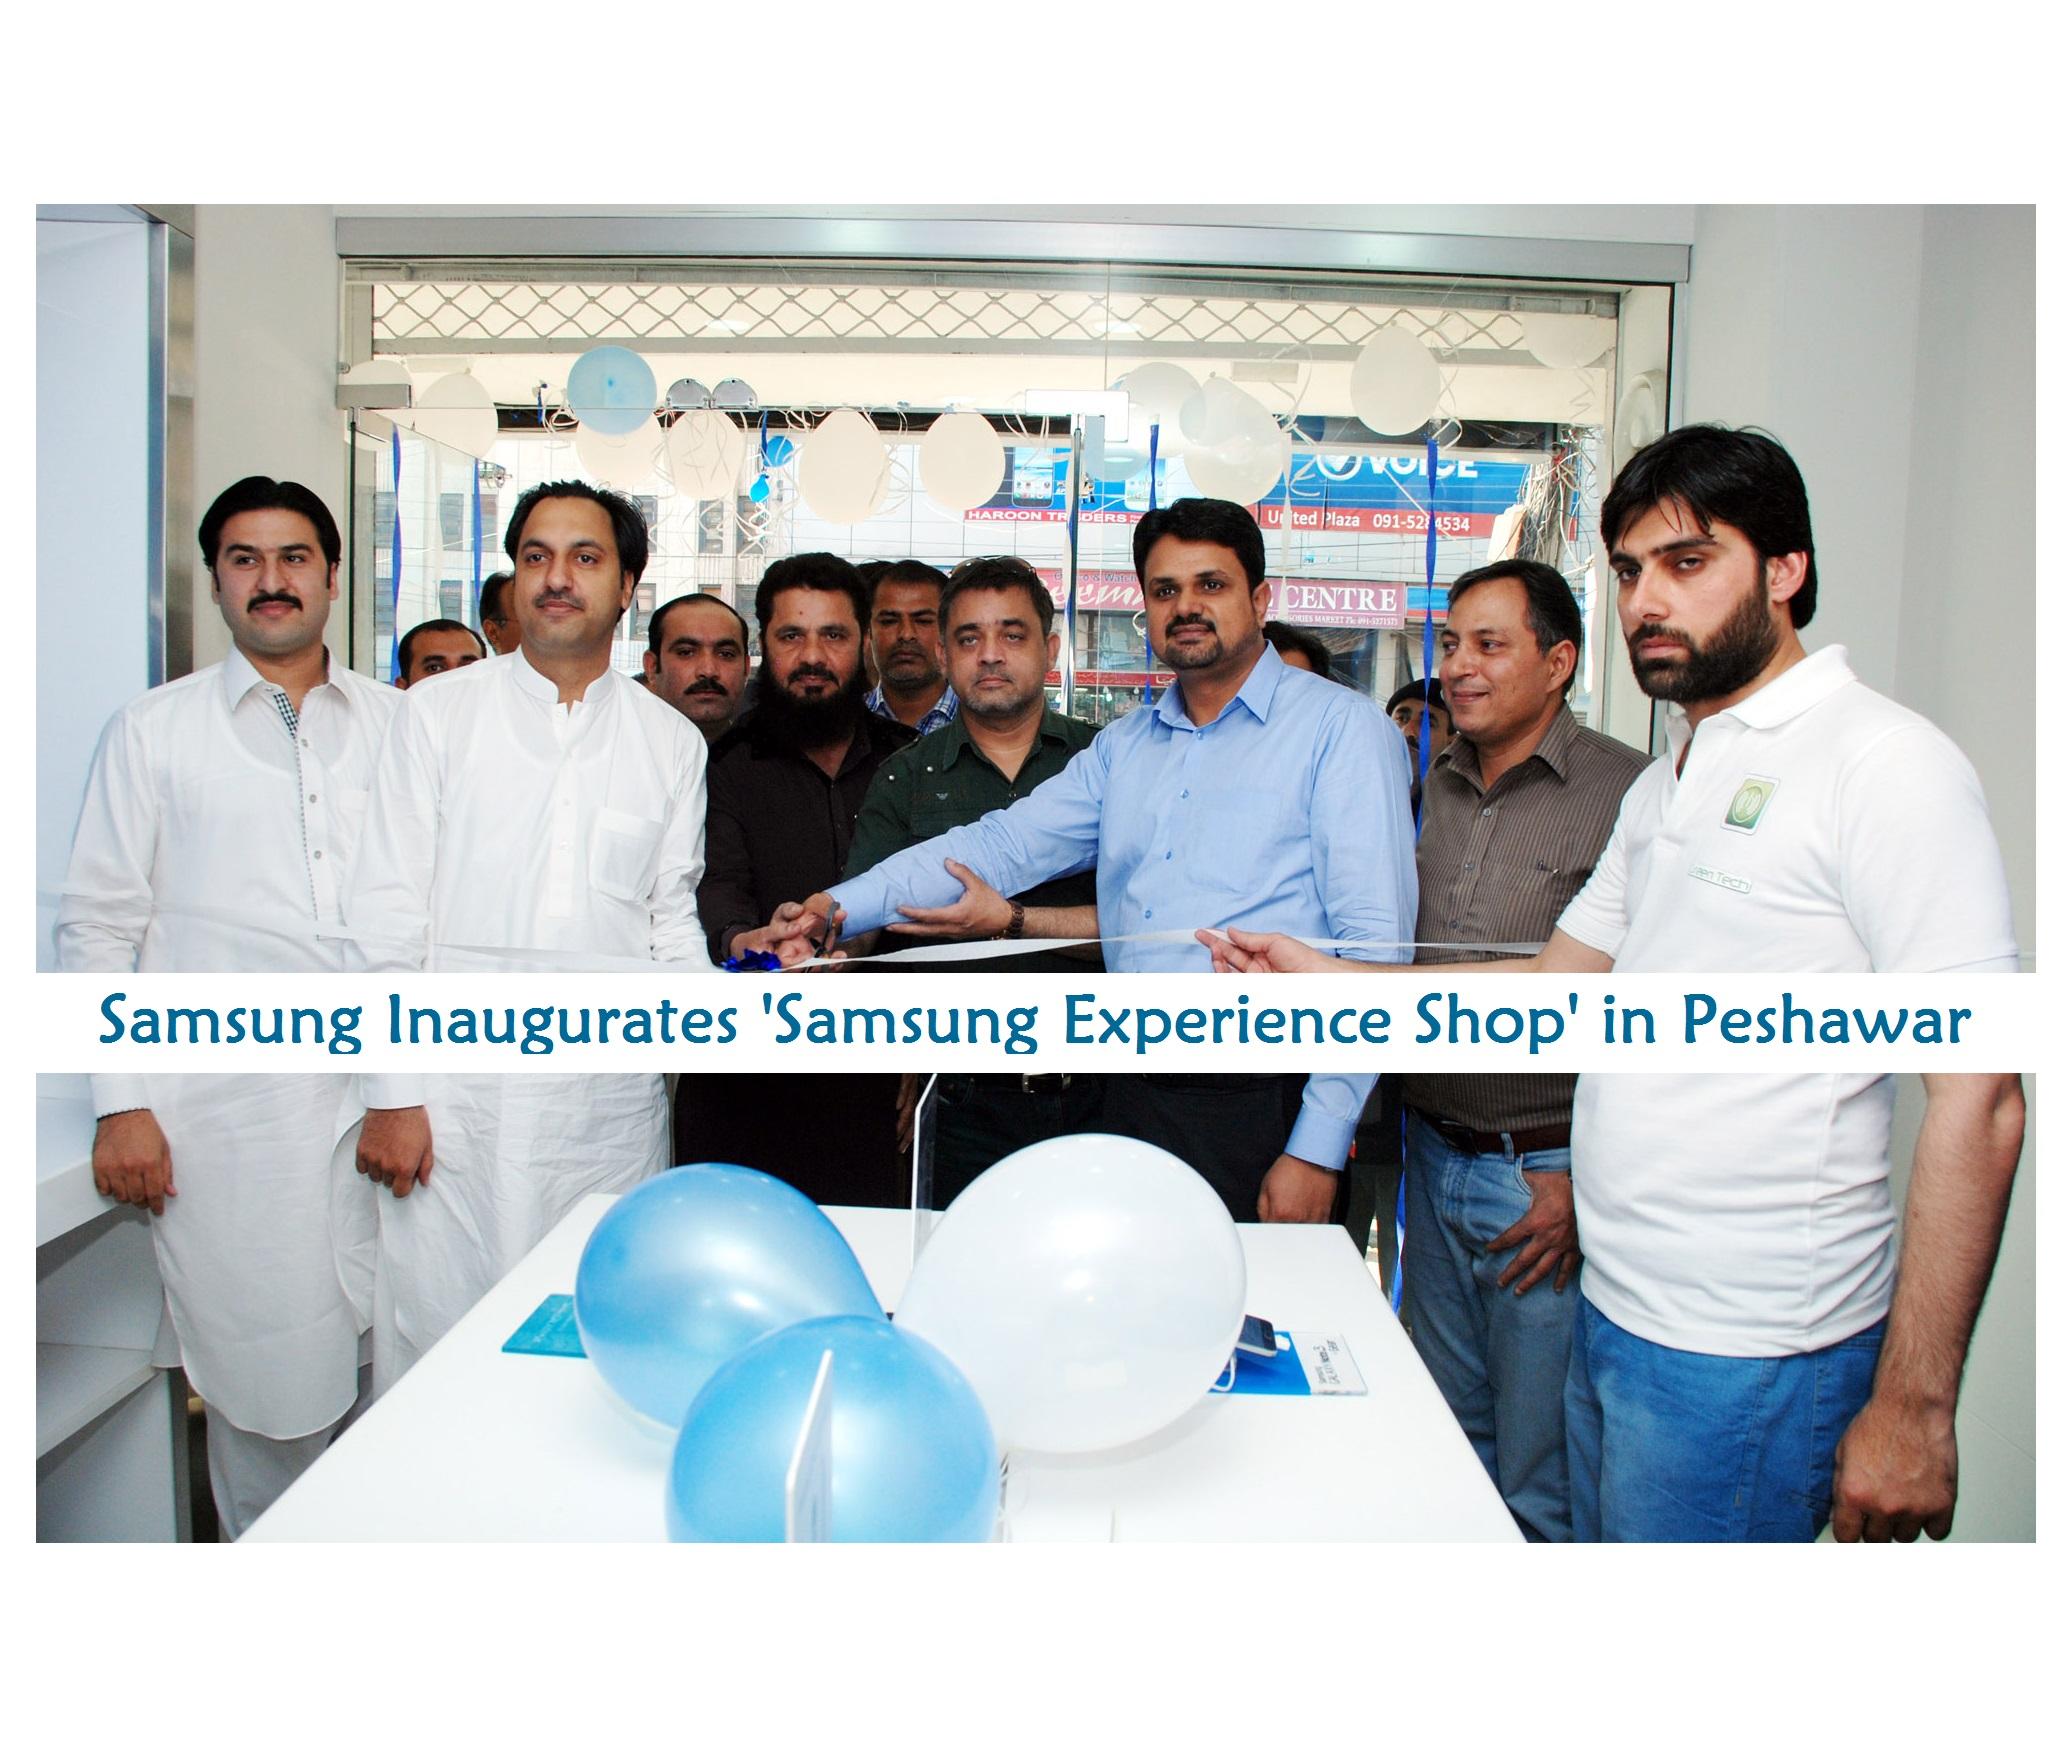 Samsung Inaugurates Samsung Experience Shop in Peshawar